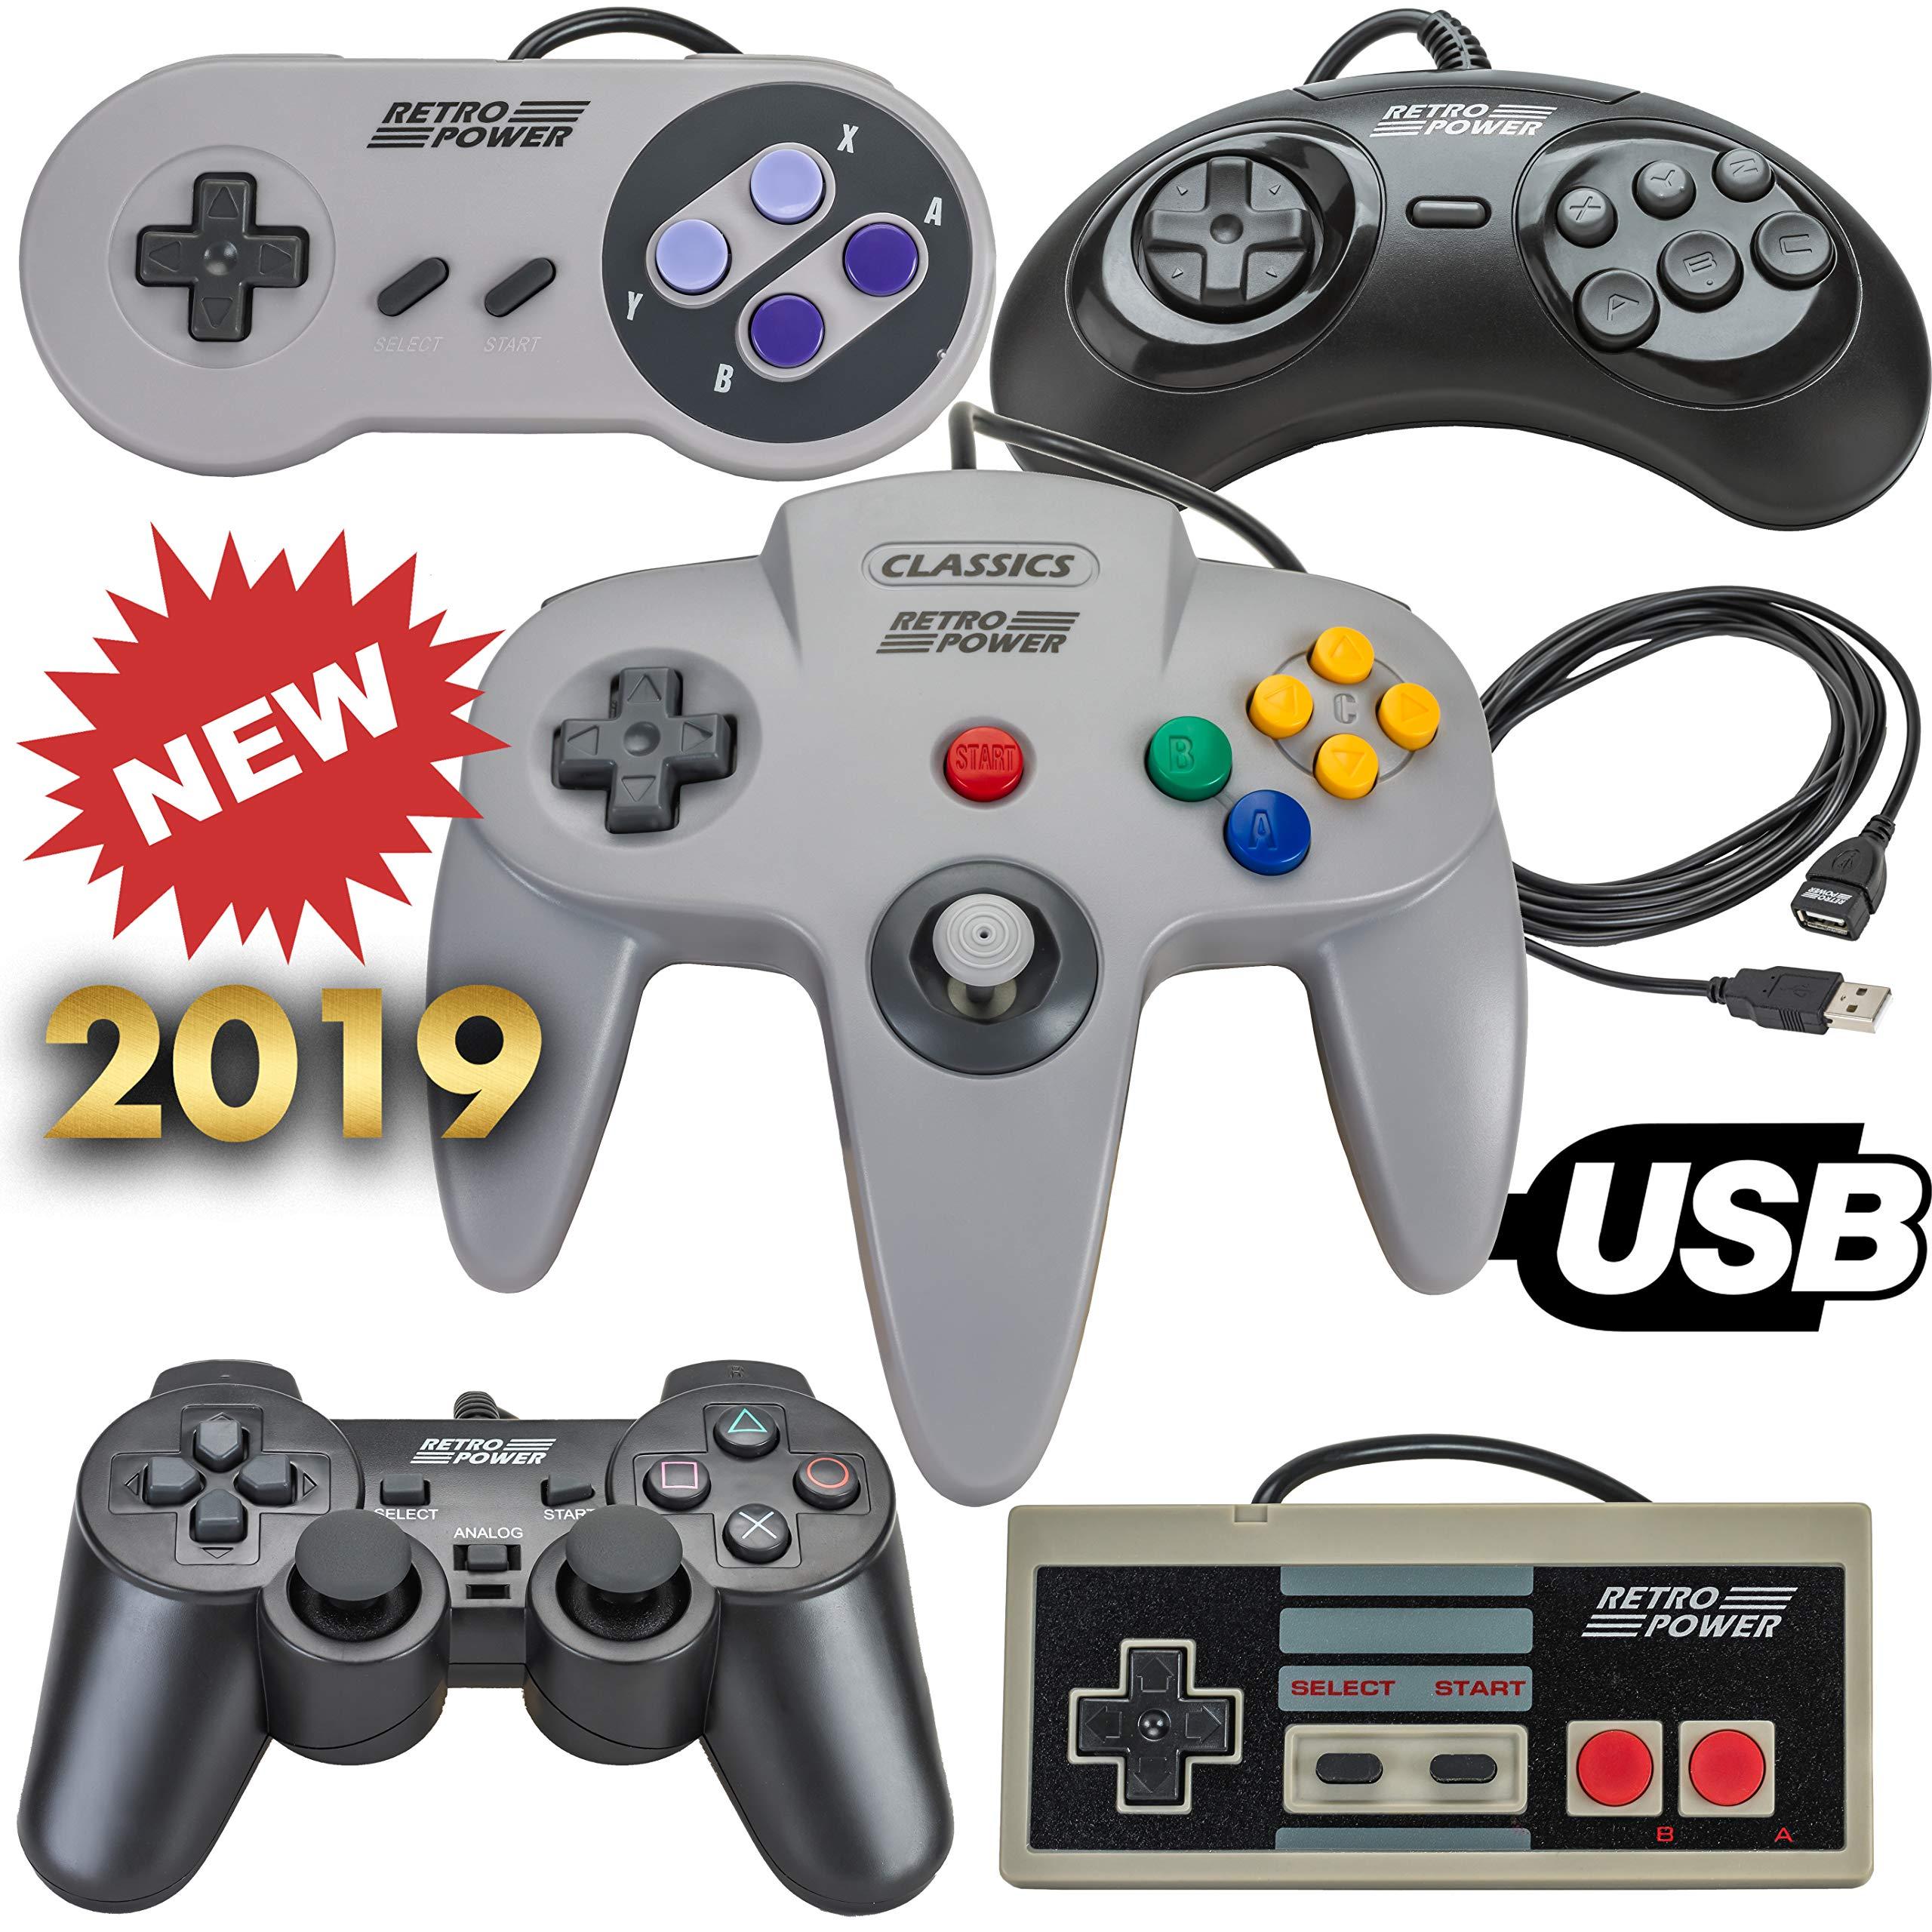 New 2019: 5 USB Classic Controllers - NES, SNES, Sega Genesis, N64, Playstation 2 (PS2) for RetroPie, PC, HyperSpin, MAME, Emulator, Raspberry Pi Gamepad